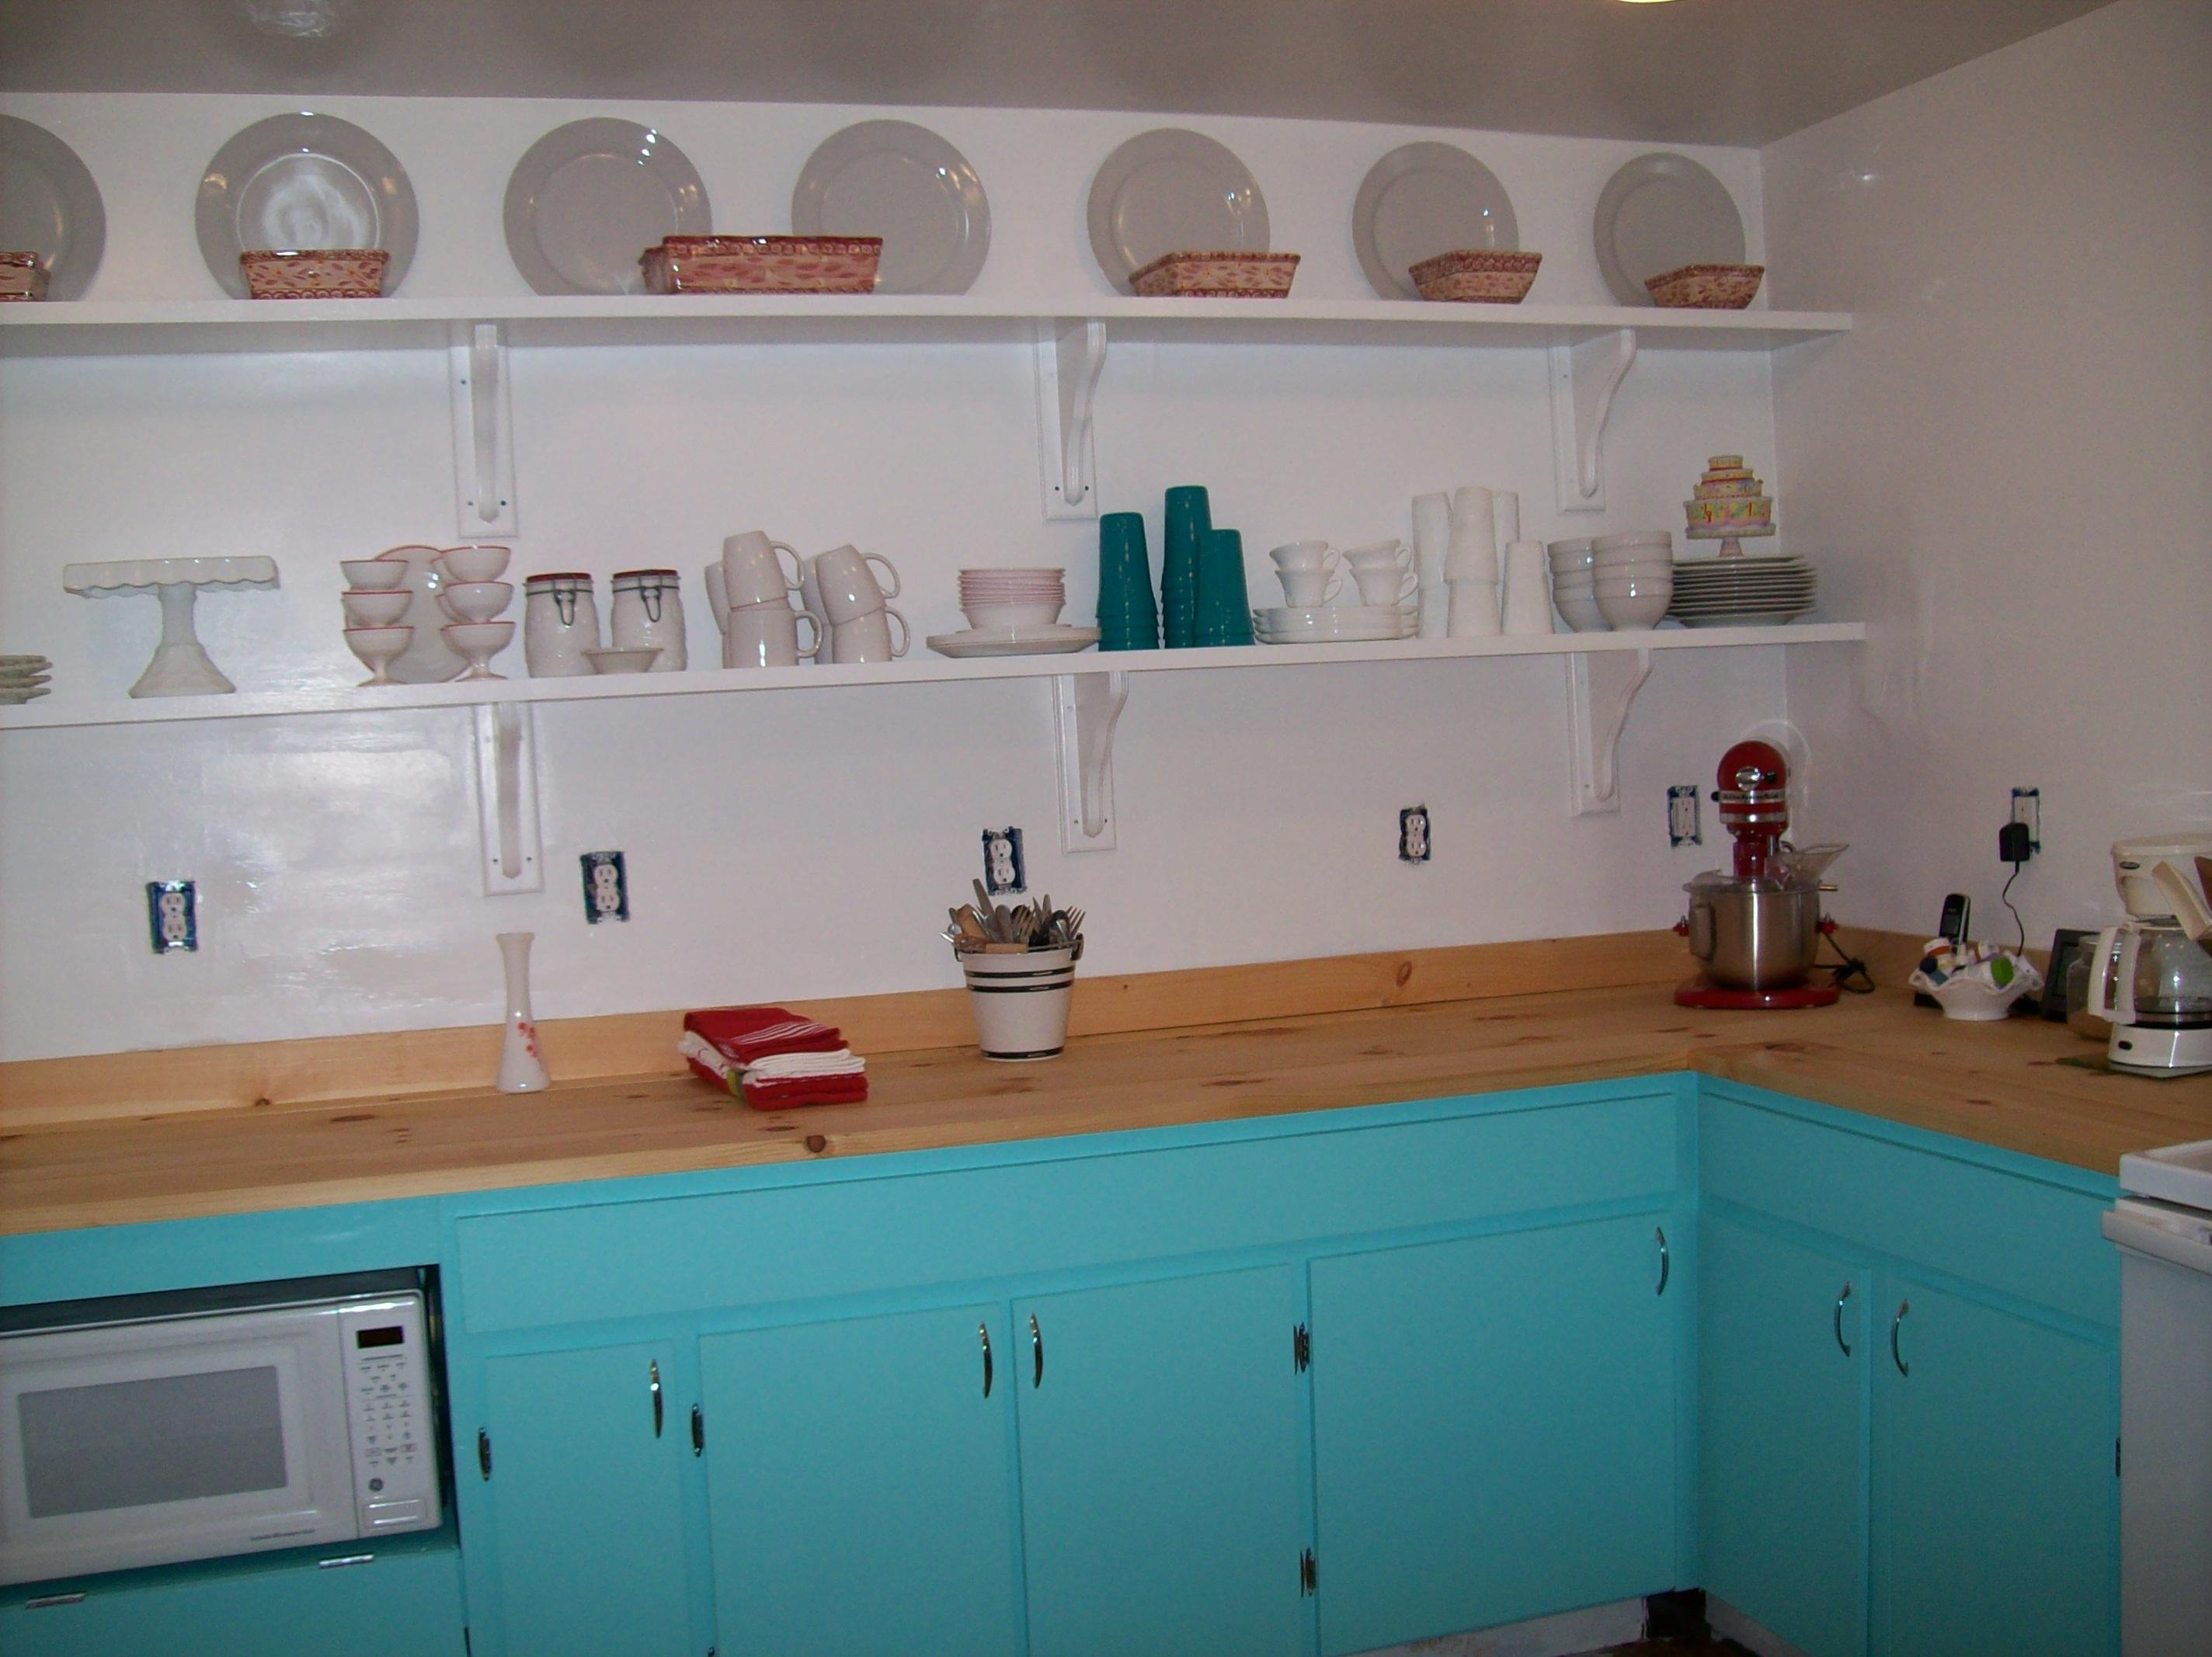 Reused Kitchen Cabinets Salvaged Kitchen Cabinets Salvaged Kitchen Cabinets Nj Sarkem